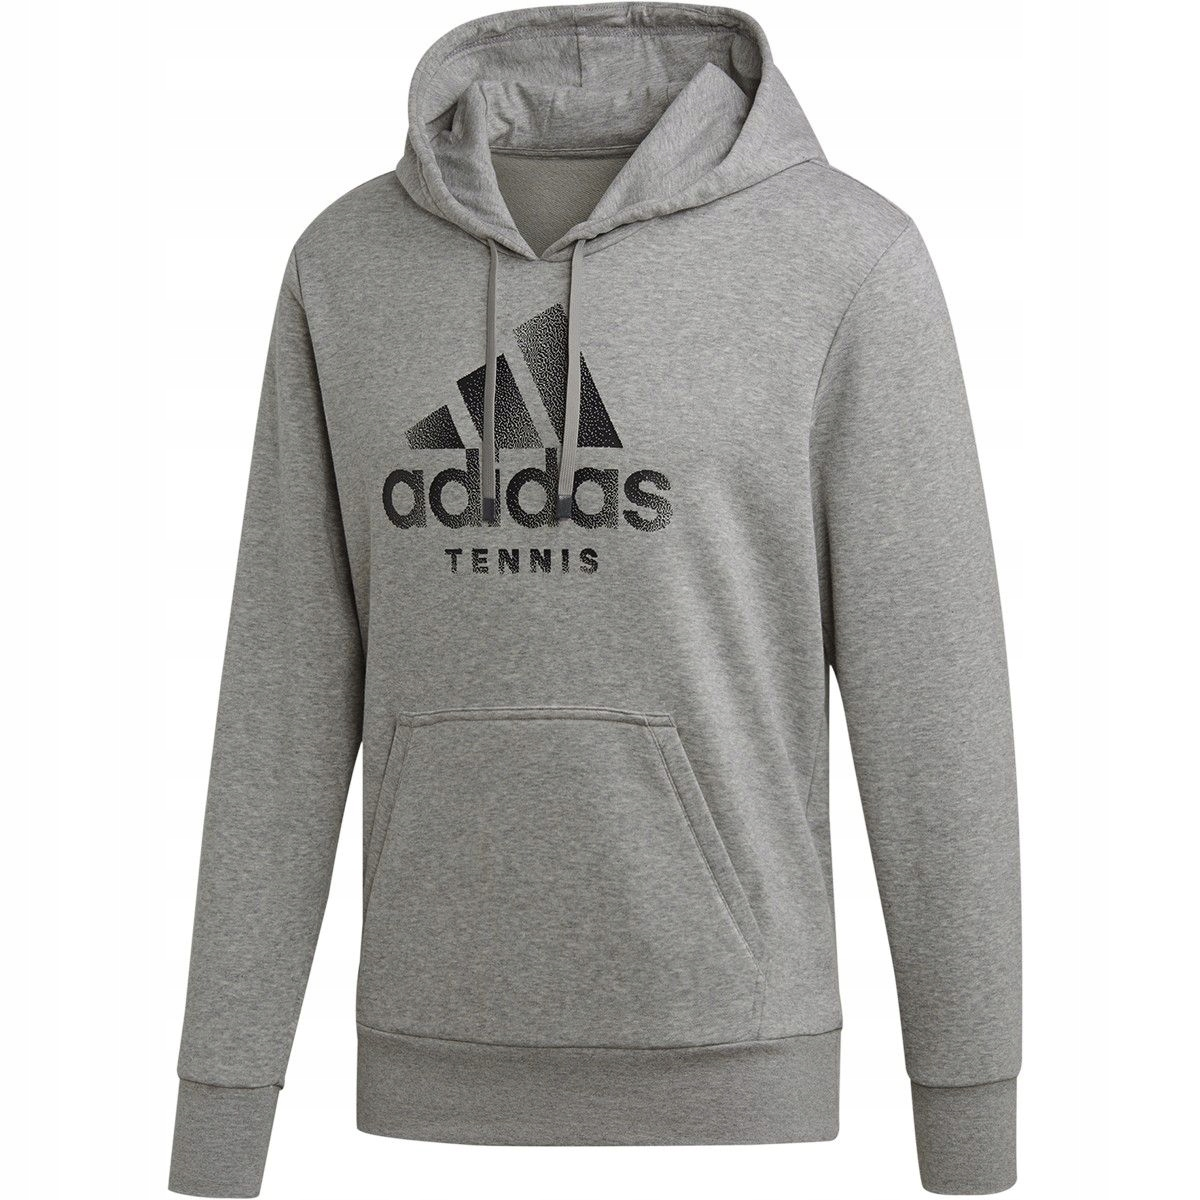 Adidas Star Wars bluza męska nowa 38 M